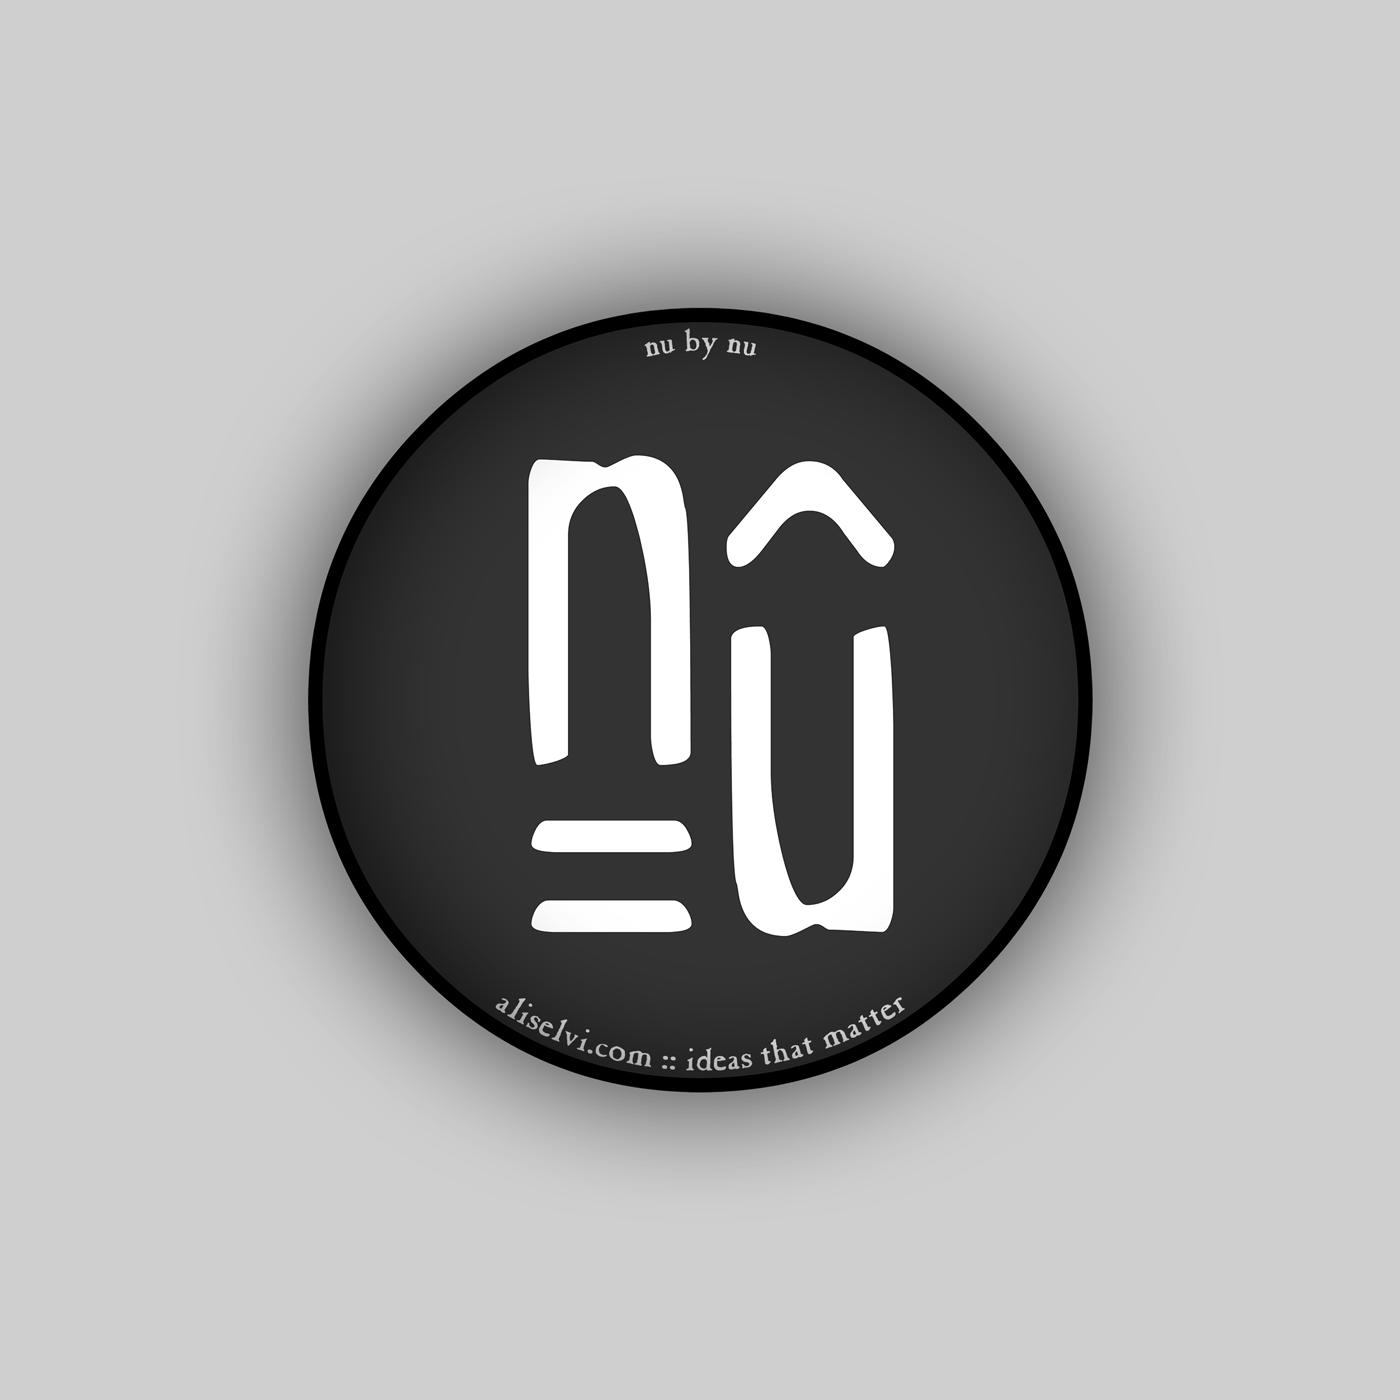 http://aliselvi.com/wp-content/uploads/2016/05/aliselvi-logo-01big1a.png